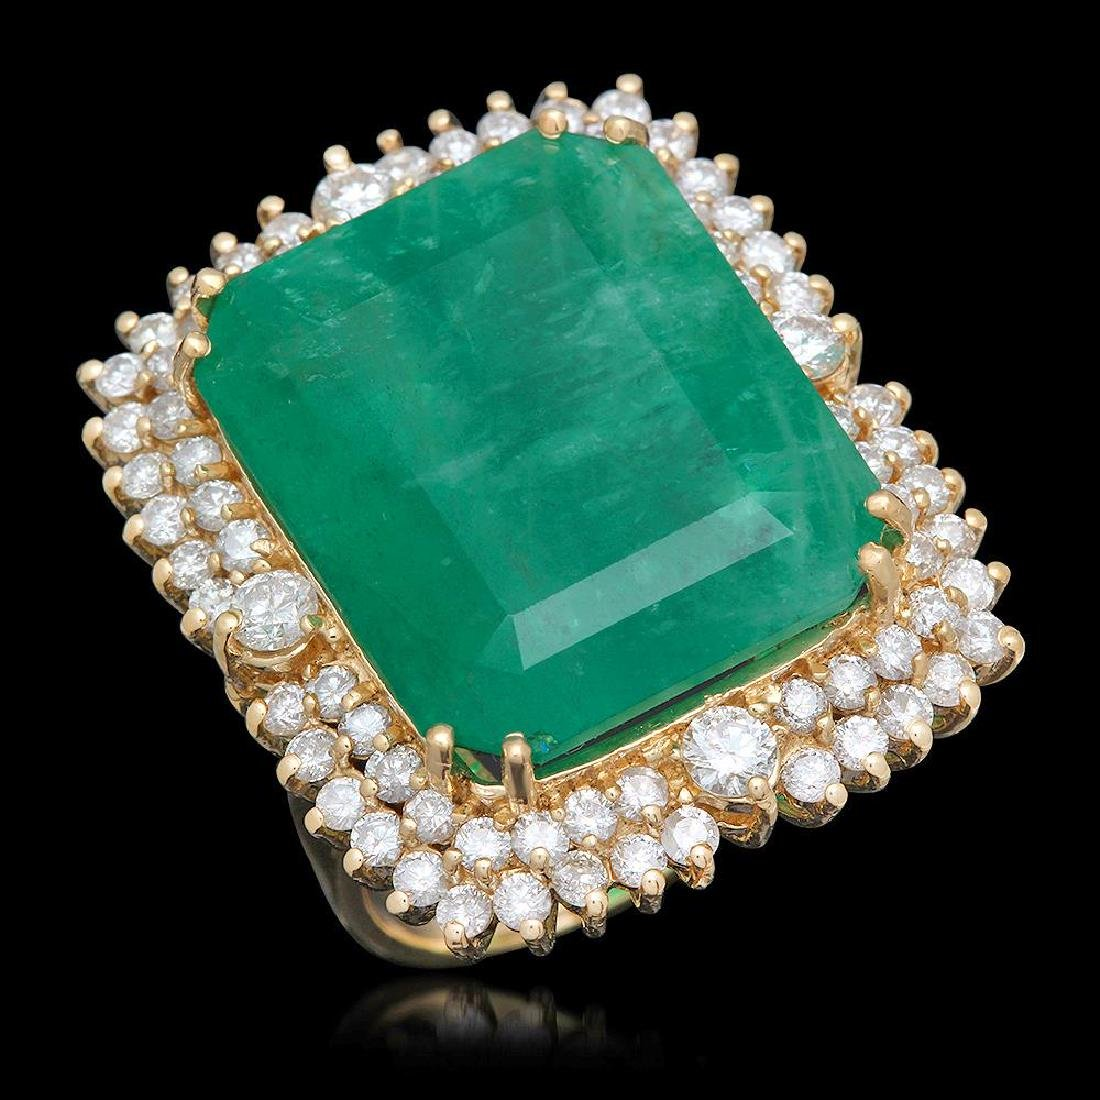 14K Gold 29.27 Emerald 2.52 Diamond Ring